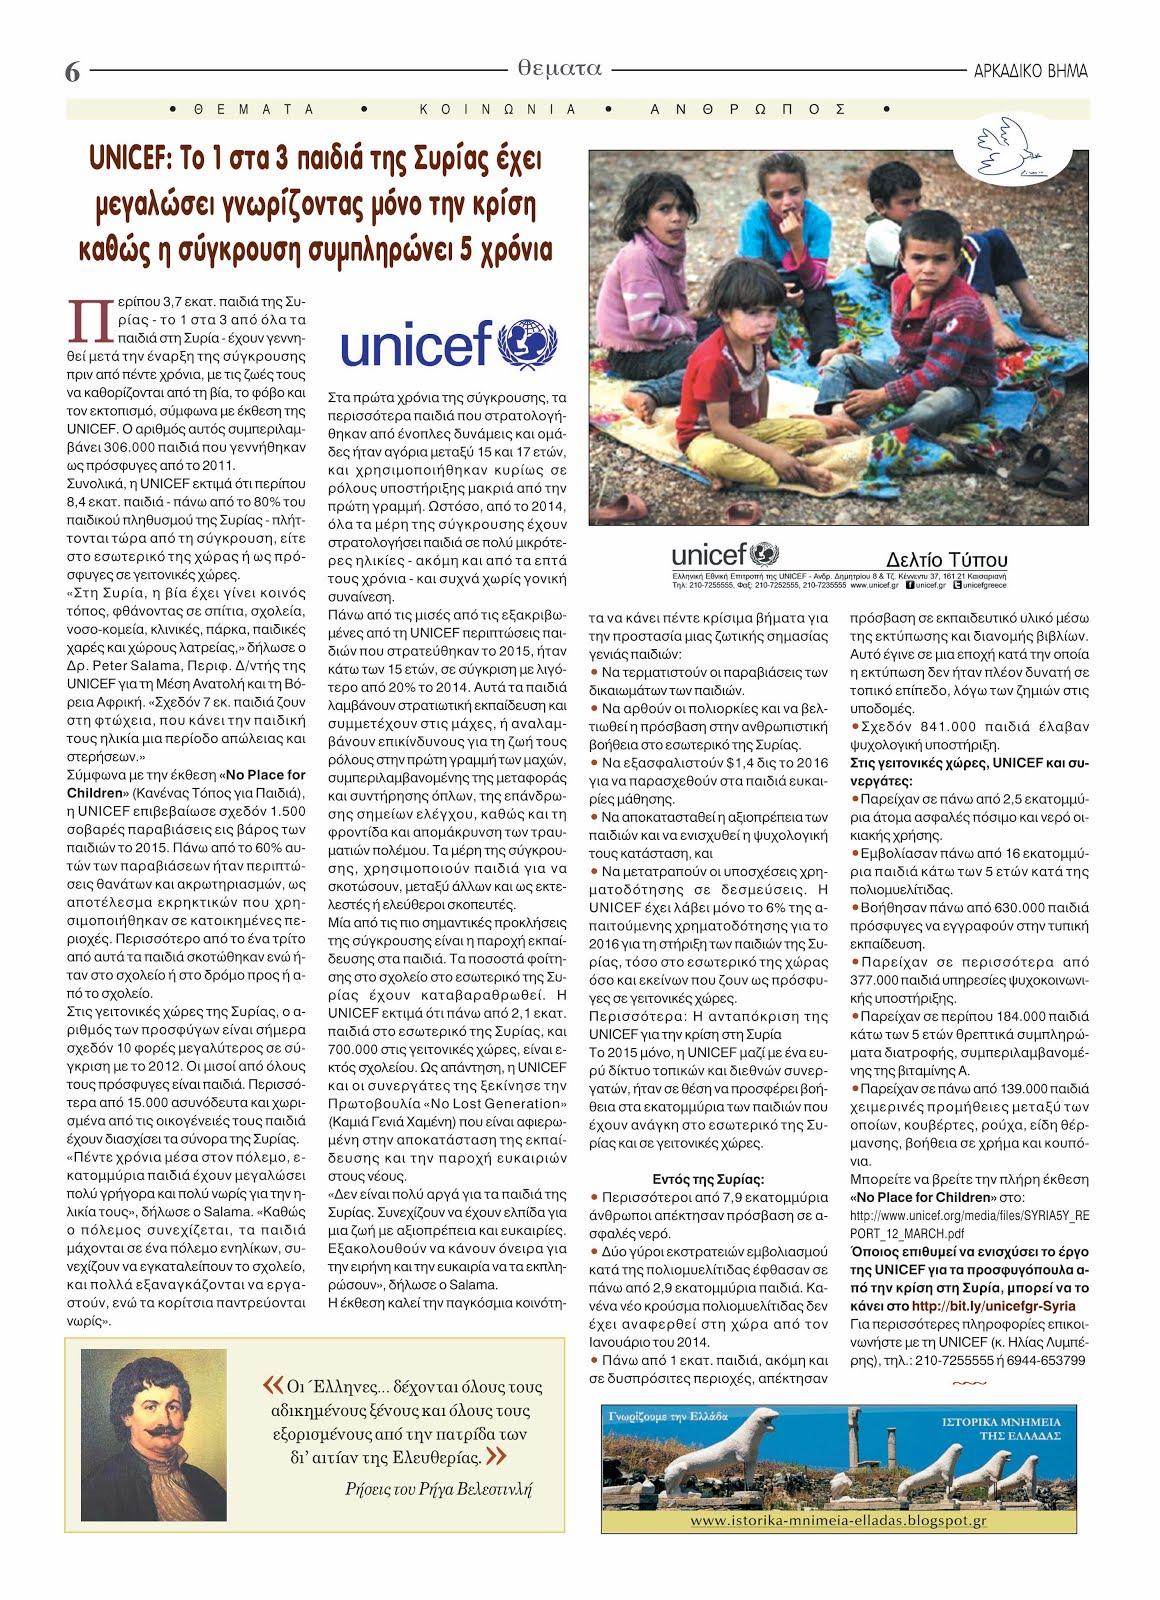 UNICEF: Το ένα στα τρία παιδιά της Συρίας